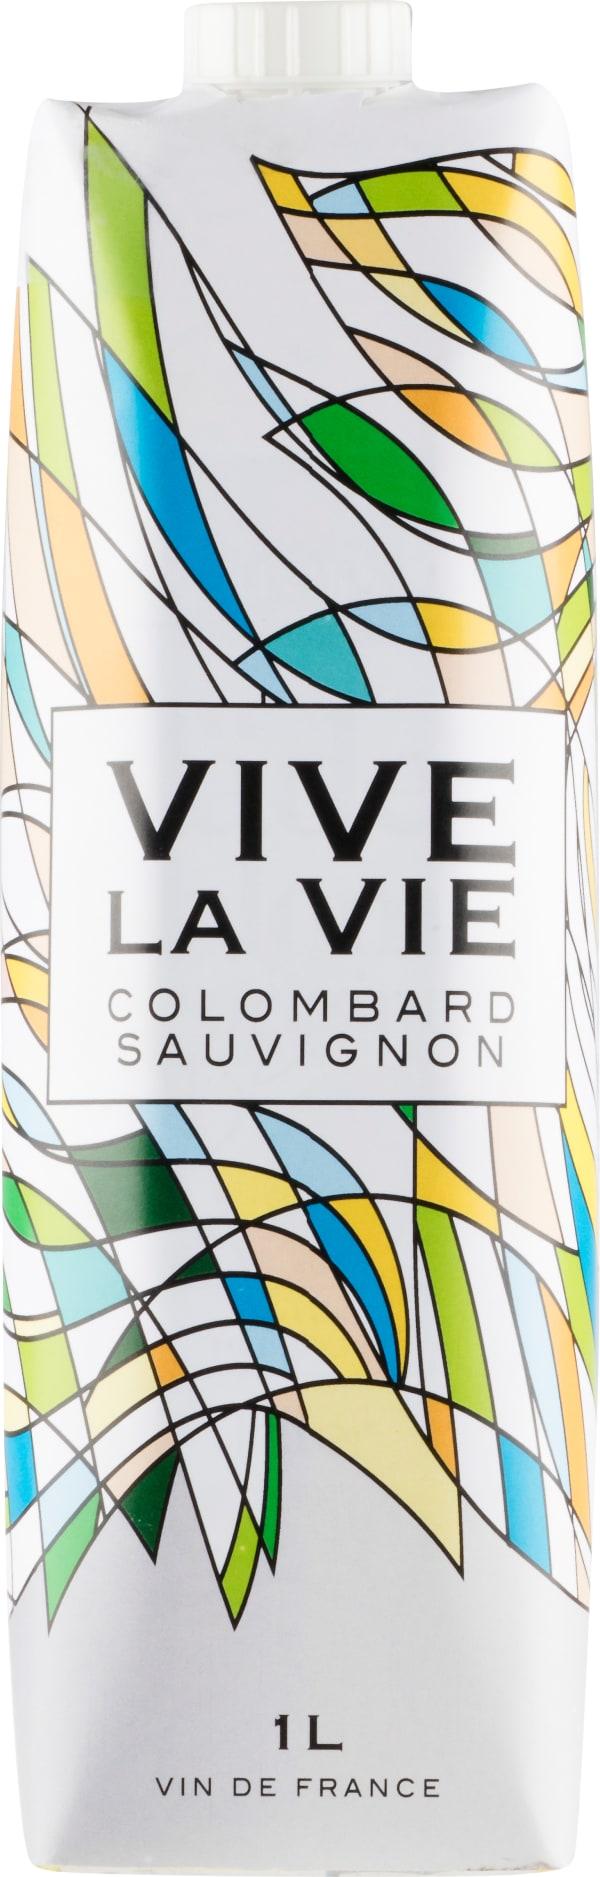 Vive la Vie Colombard Sauvignon 2019 kartongförpackning